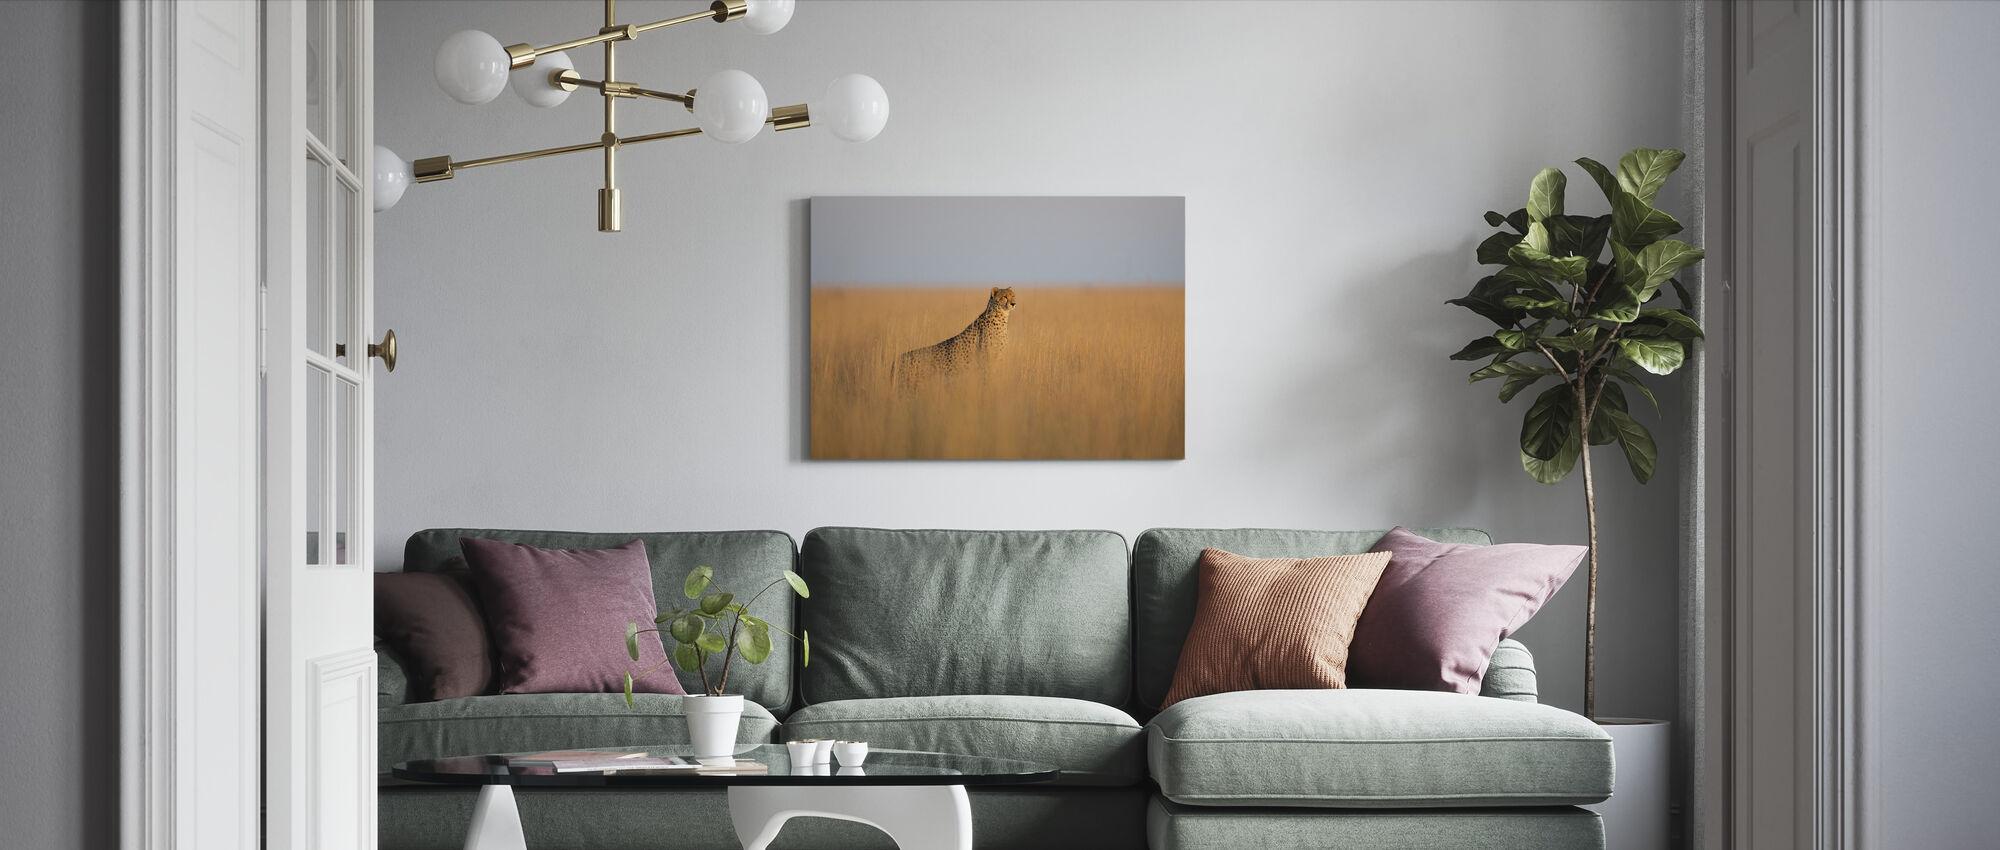 Cheetah in Long Grass - Canvas print - Living Room